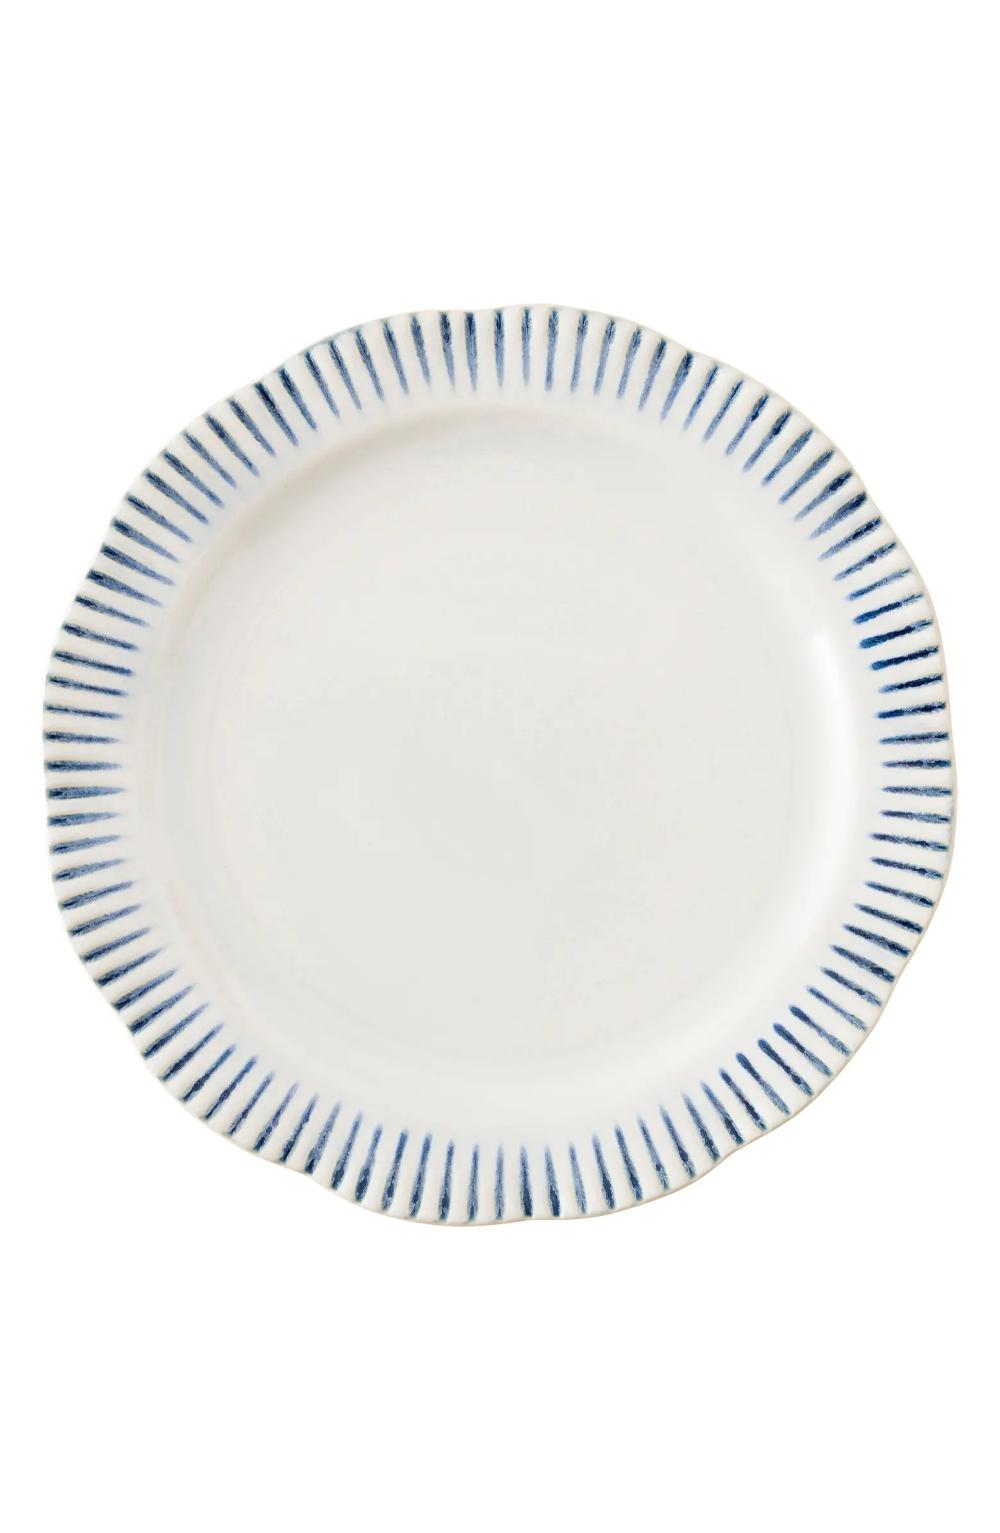 Juliska Wanderlust Collection Sitio Stripe Stoneware Dinner Plate Nordstrom Plates Dinner Plates Gold Dinnerware